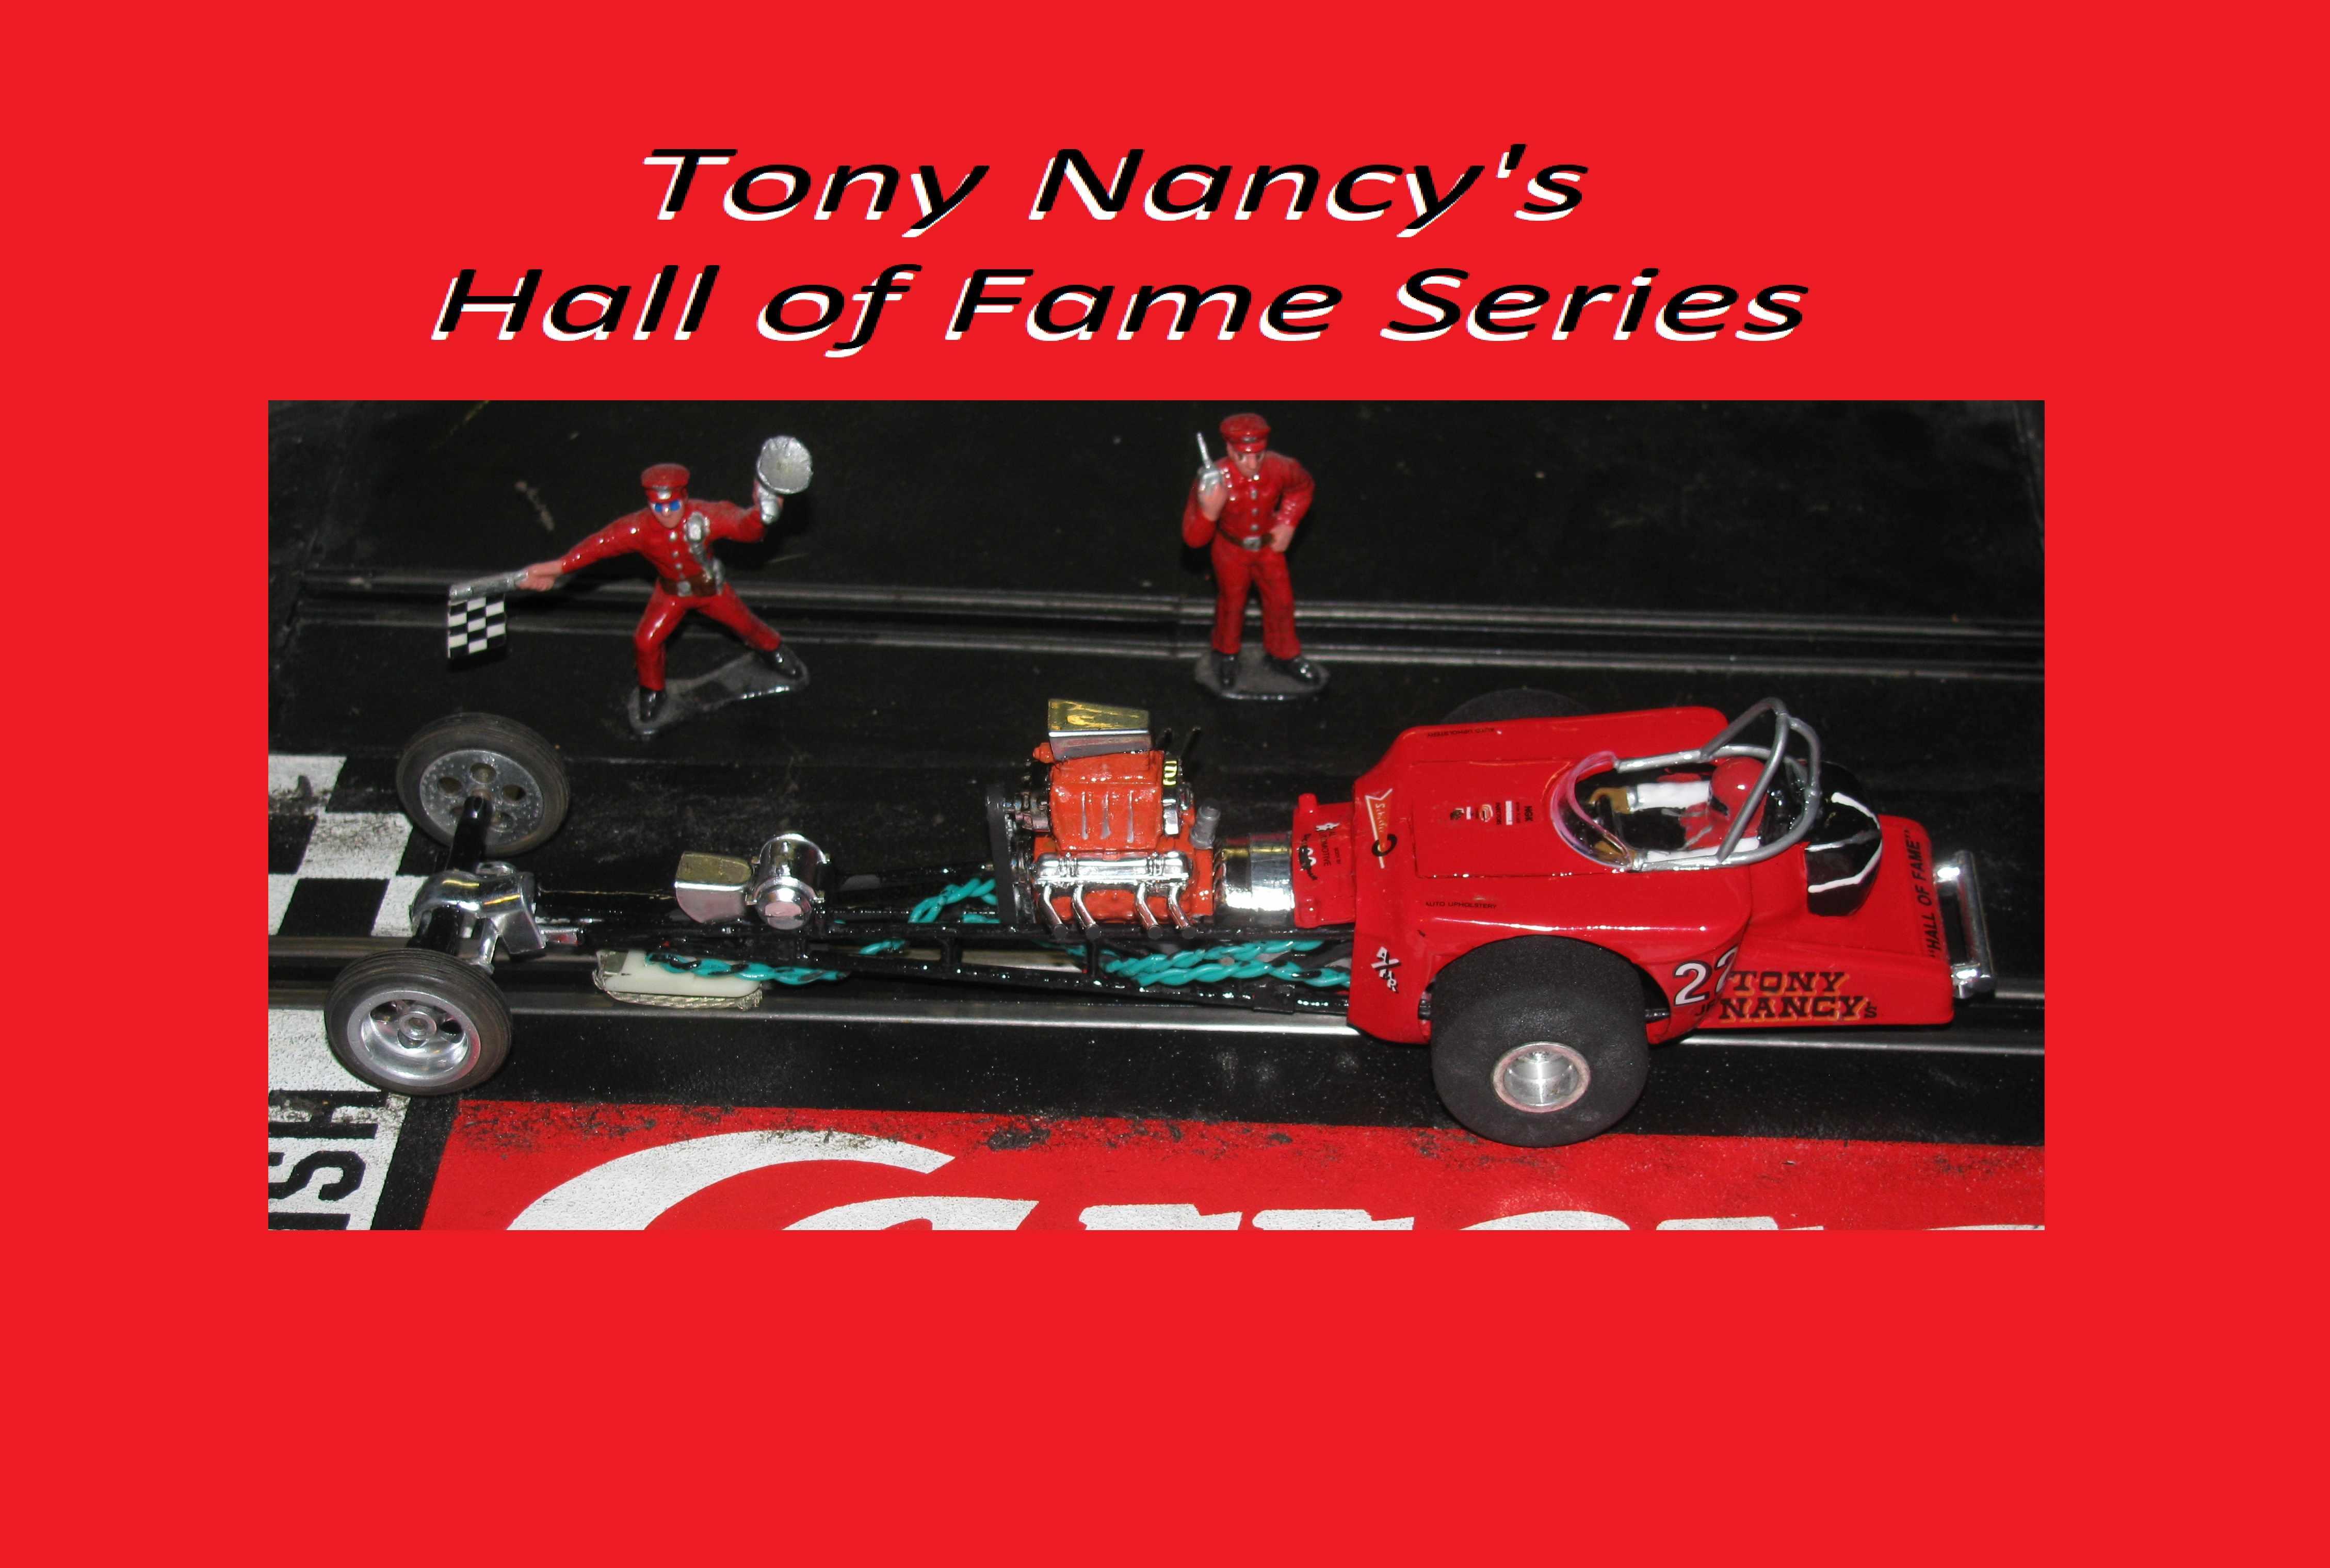 * SUMMER SALE * Vintage Revell Tony Nancy's Hall of Fame 22JR Dragster Slot Car 1/32-1/24 Scale